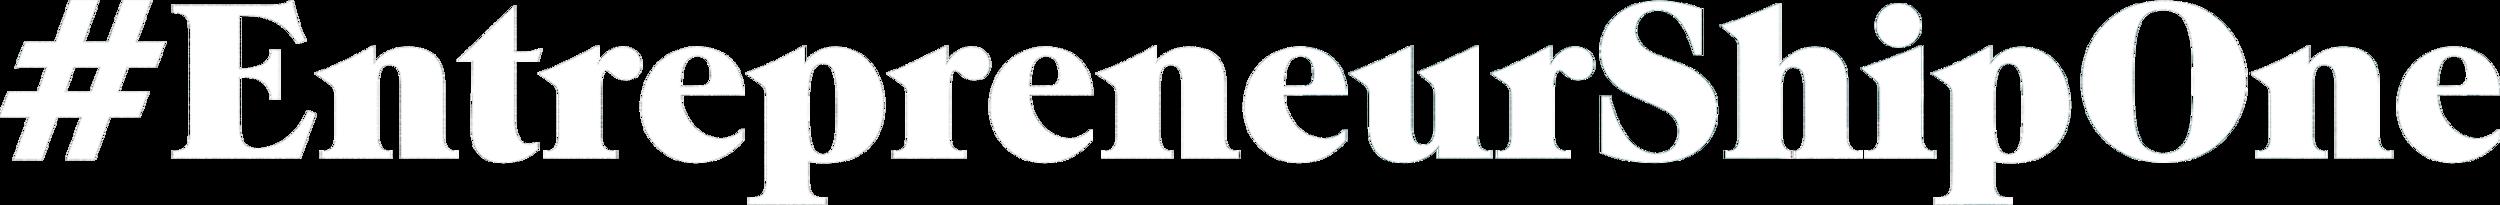 eone-logo-2.png